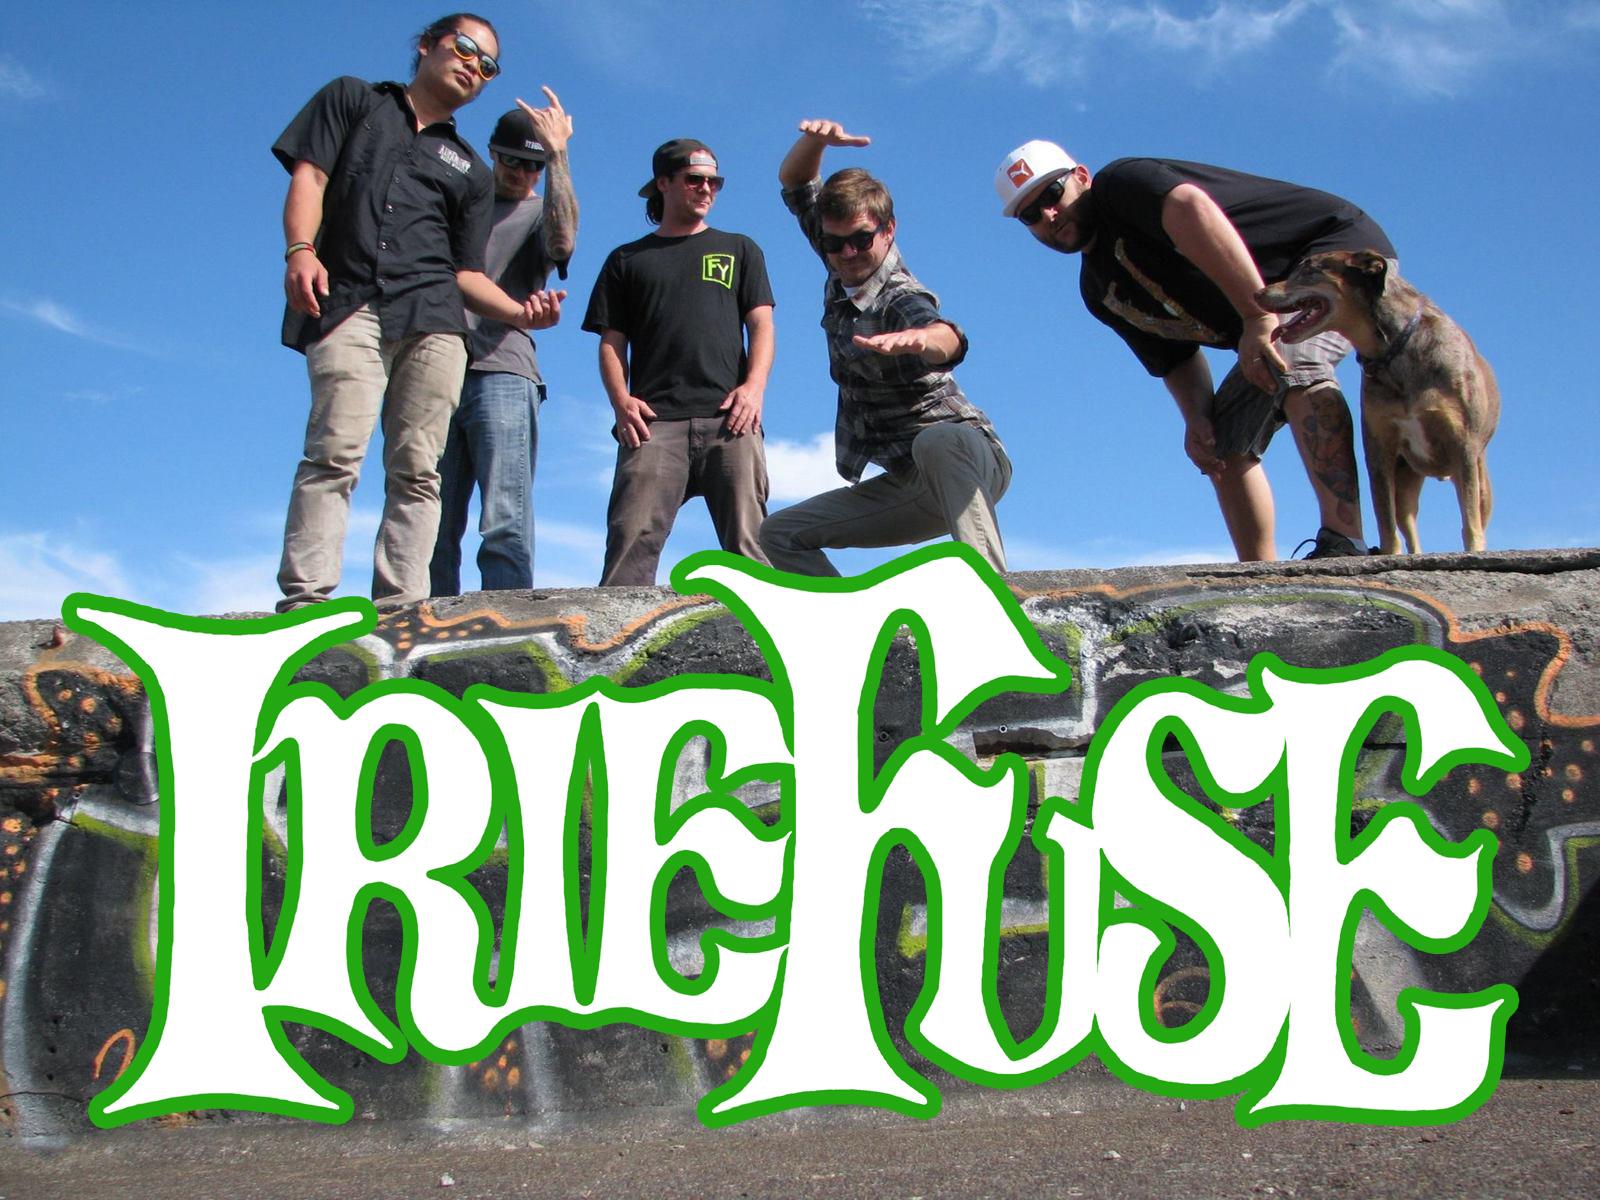 iriefuse band and logo.jpg